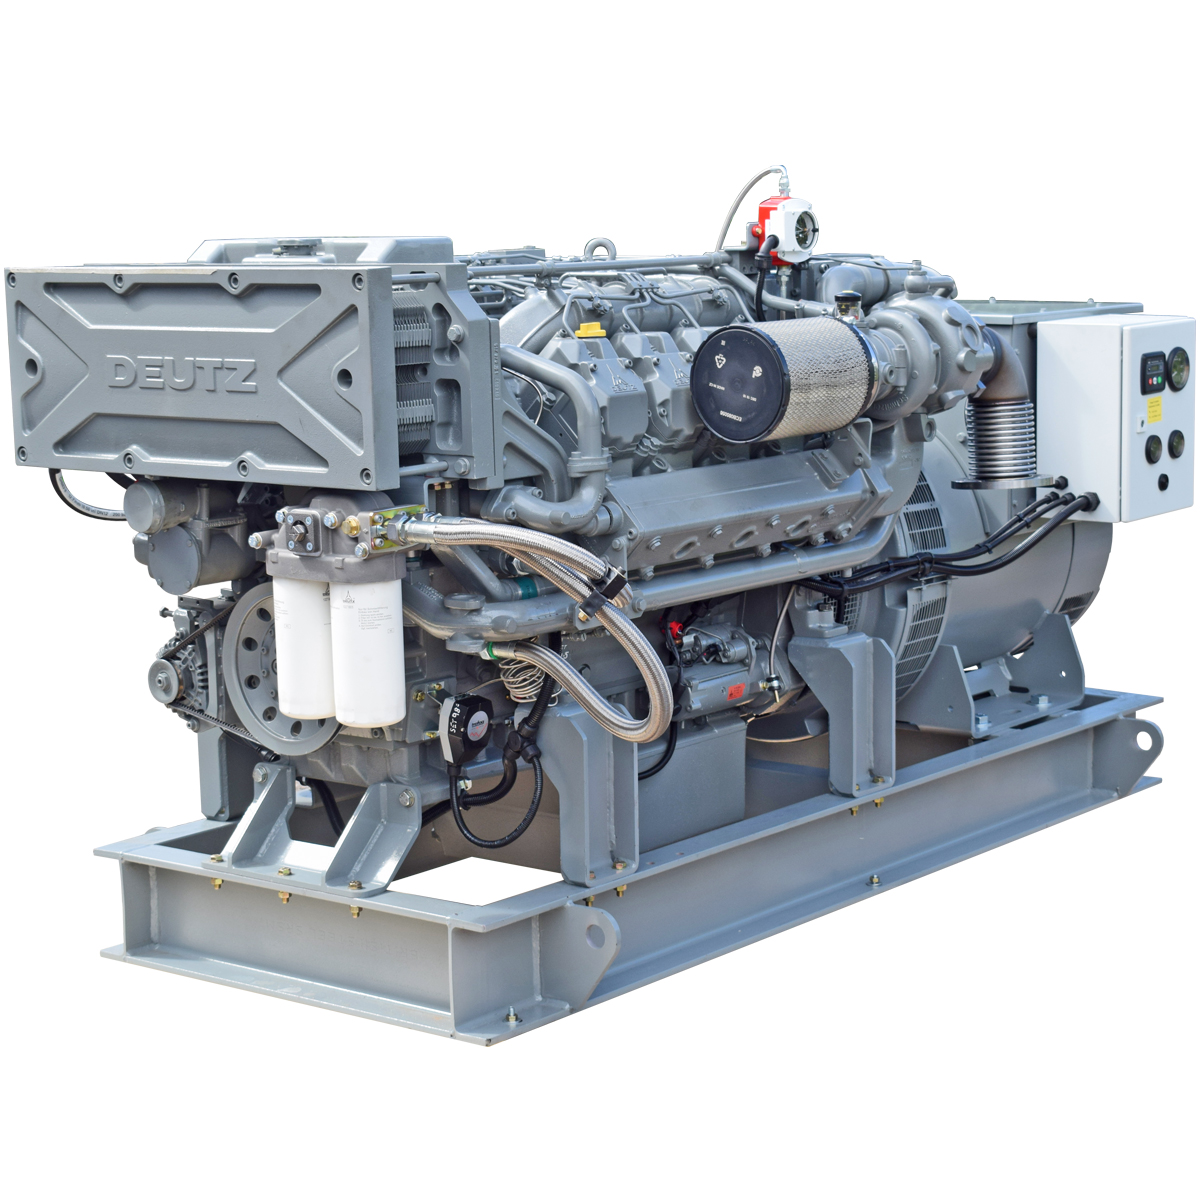 Beta Marine Bespoke Marine Generating Sets Baudouin, Deutz, Cummins, Perkins, Scania or Volvo Based Marine Generating Sets from 28 to 1,150 kVA. Available to class